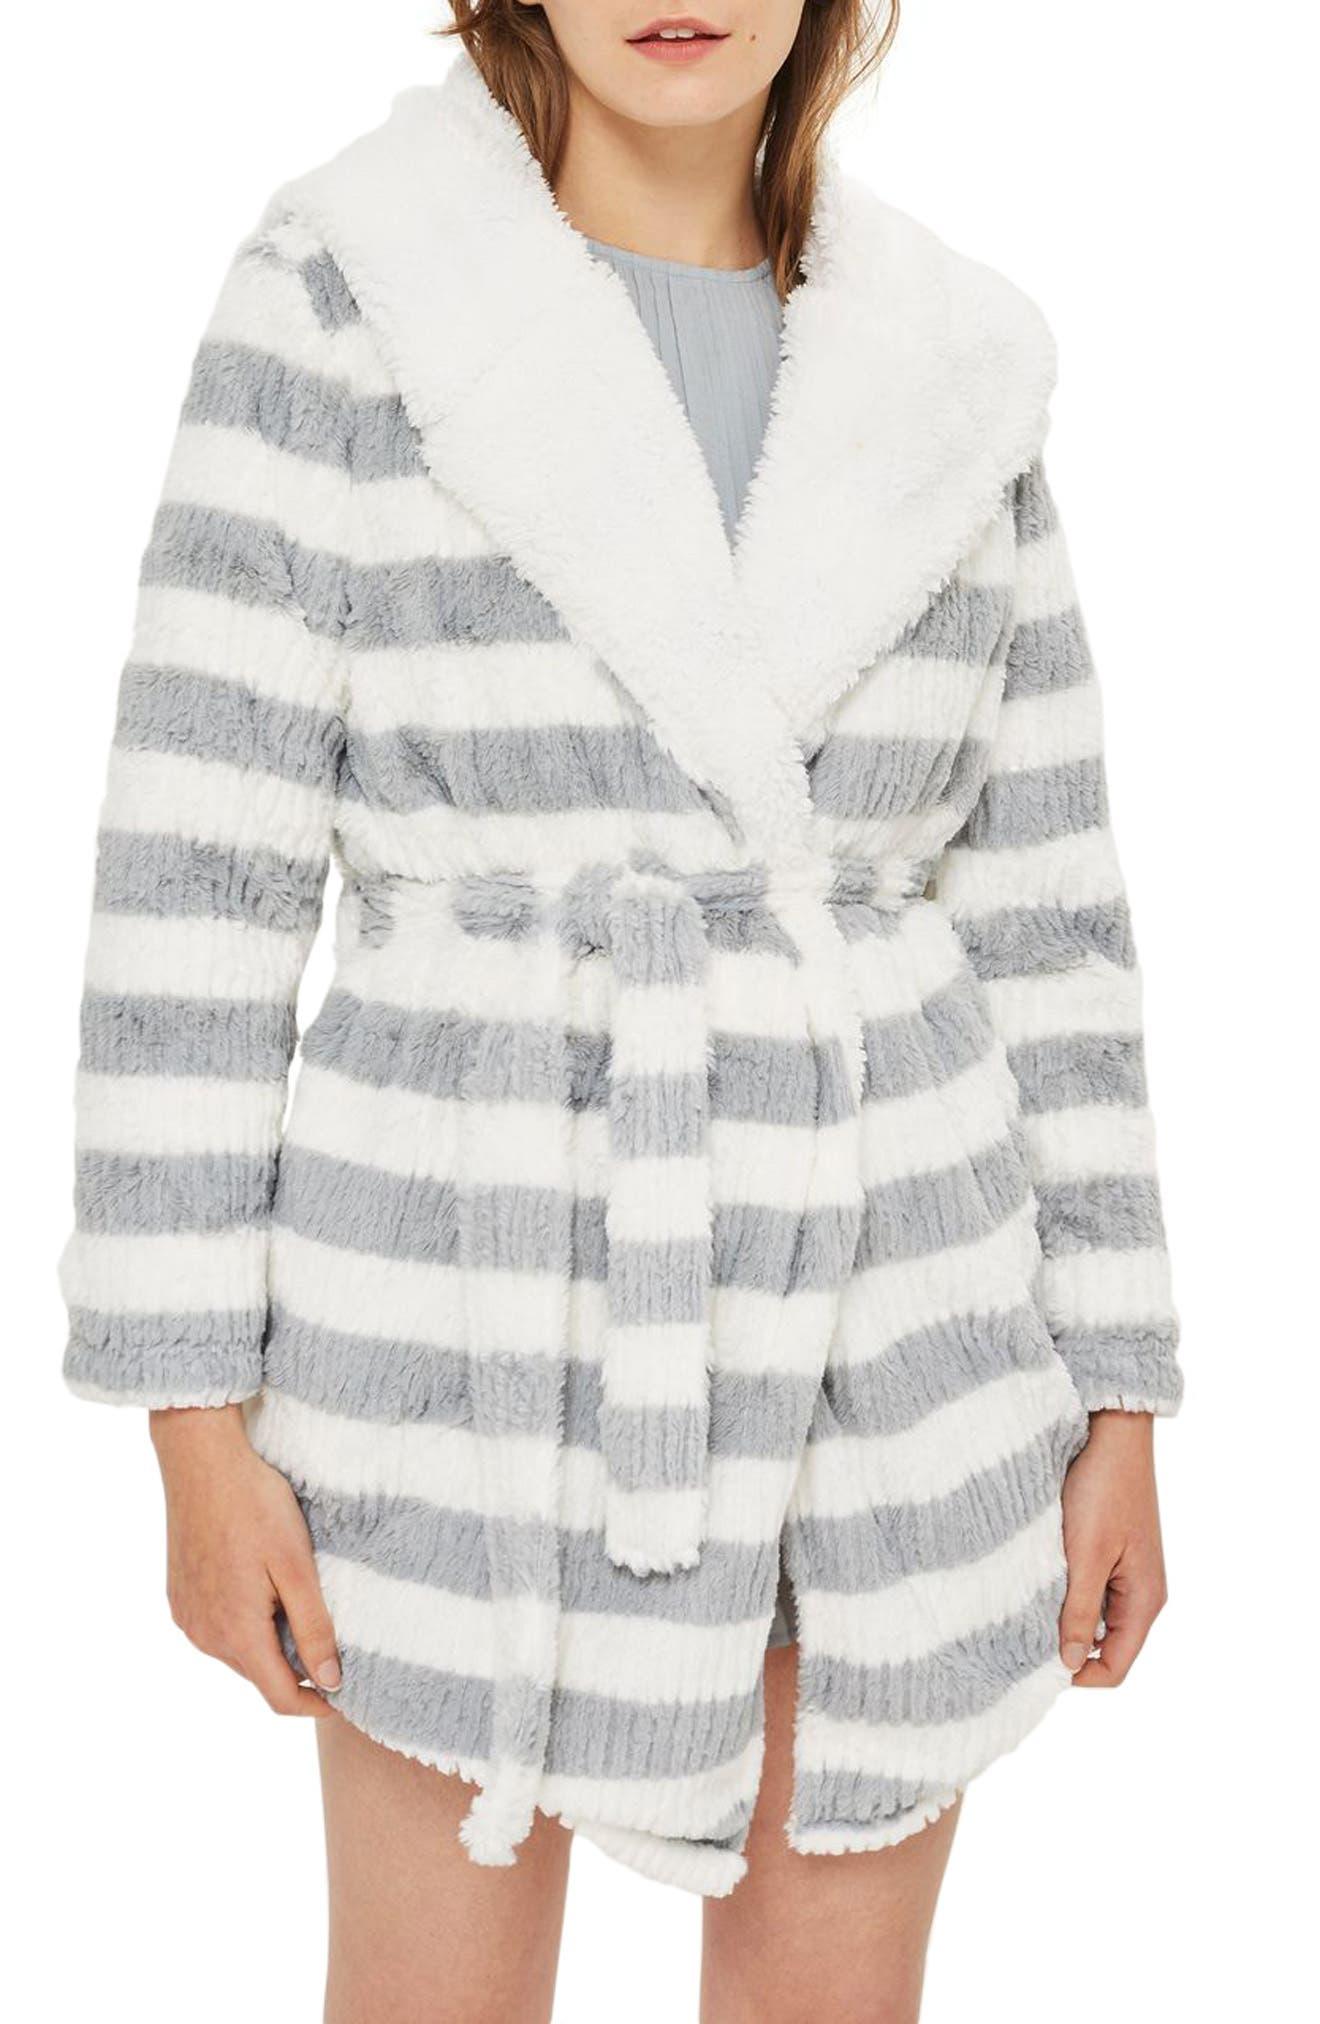 Stripe Short Robe,                             Main thumbnail 1, color,                             Grey Multi